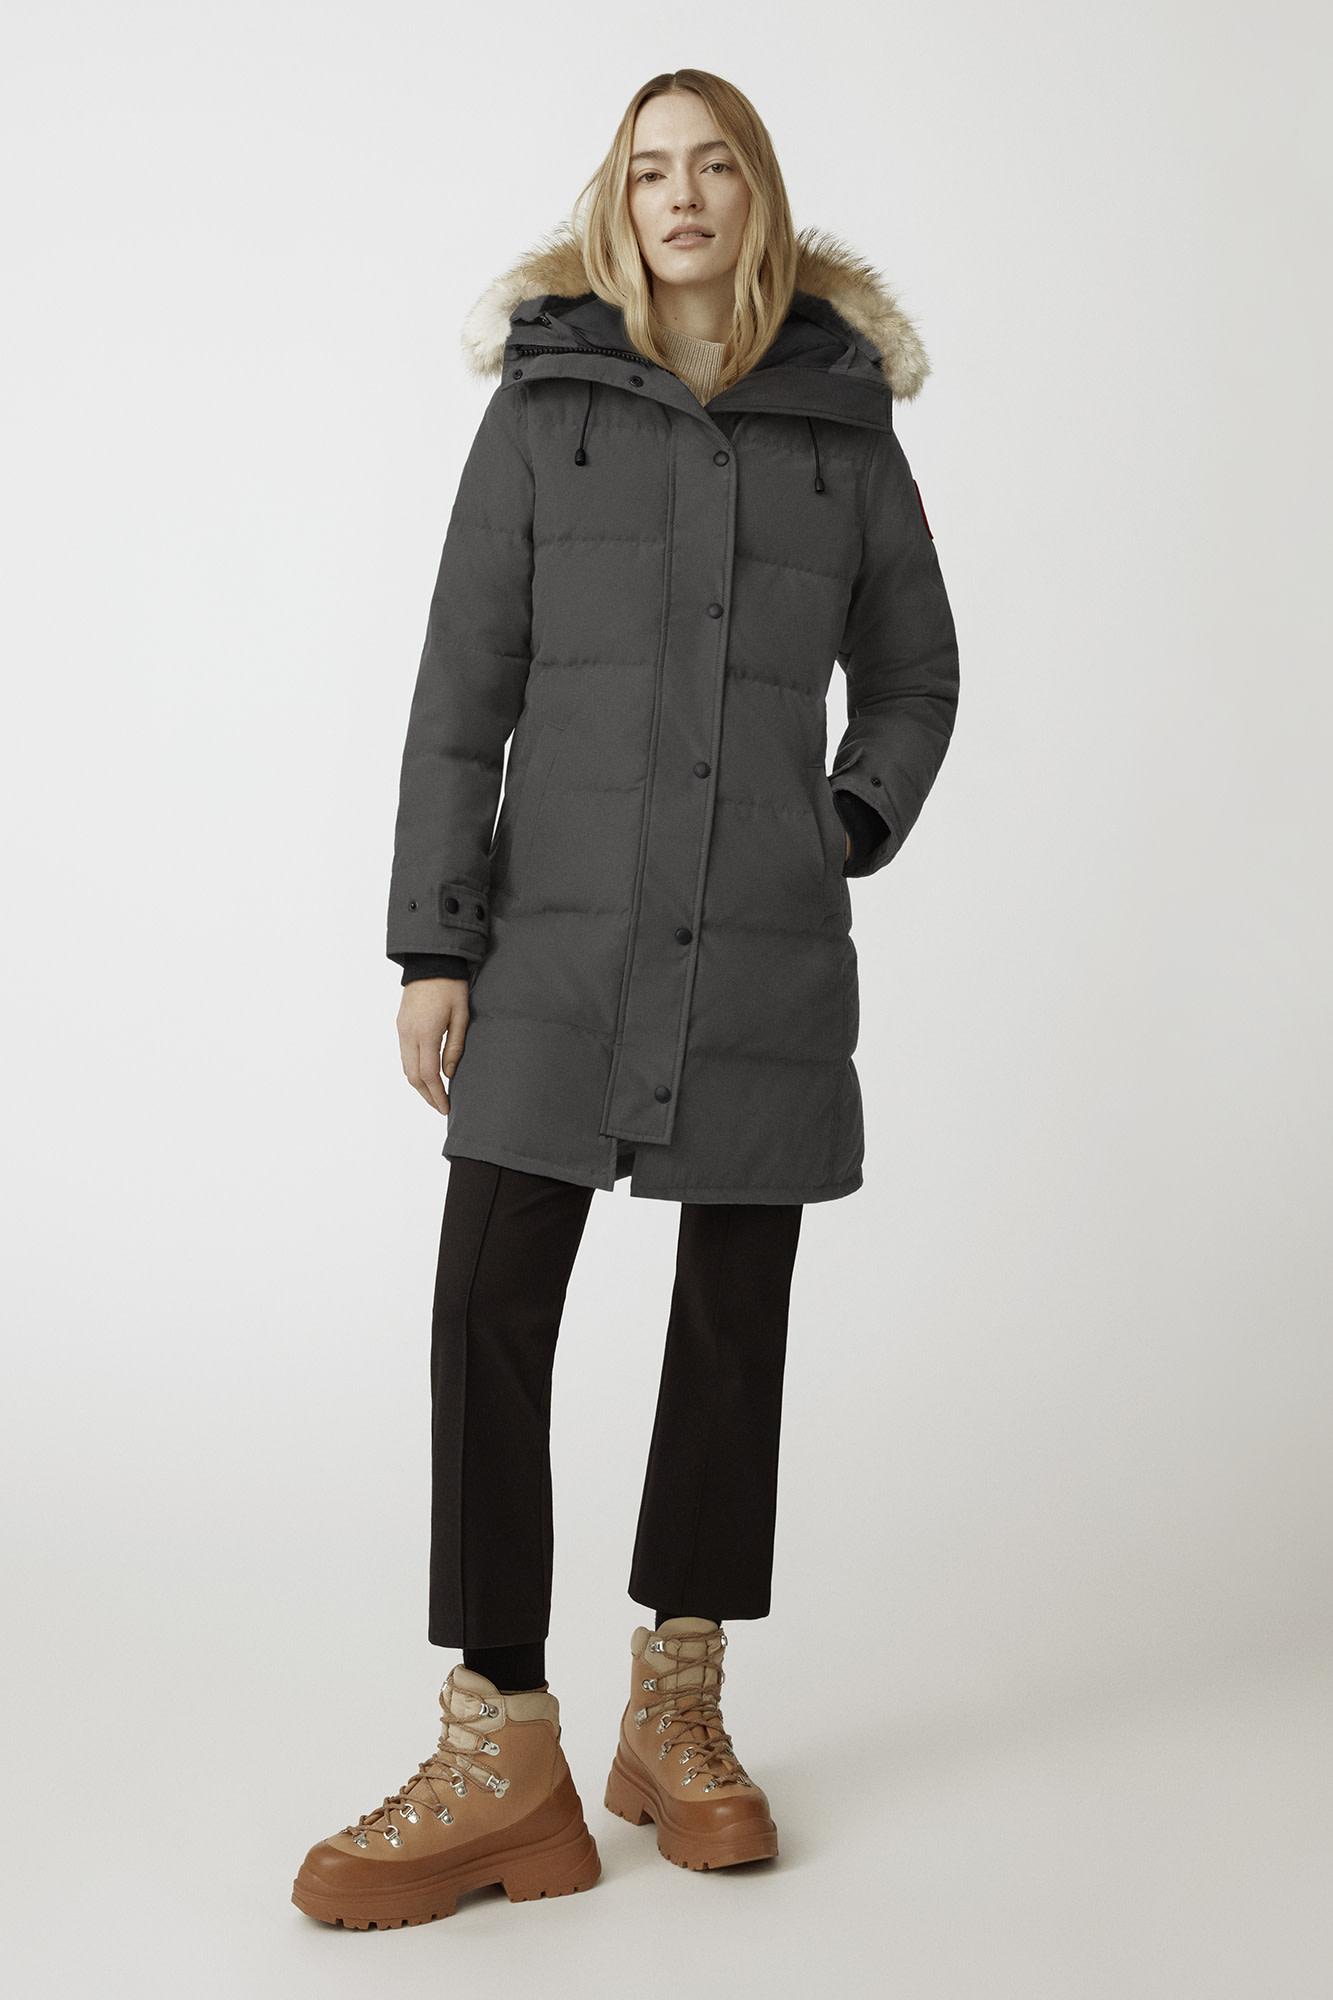 Canada Goose 加拿大鹅 Shelburne 女式派克大衣羽绒服 3802L XS码 8.1折$809.7 海淘转运到手约¥5385 天猫¥9100